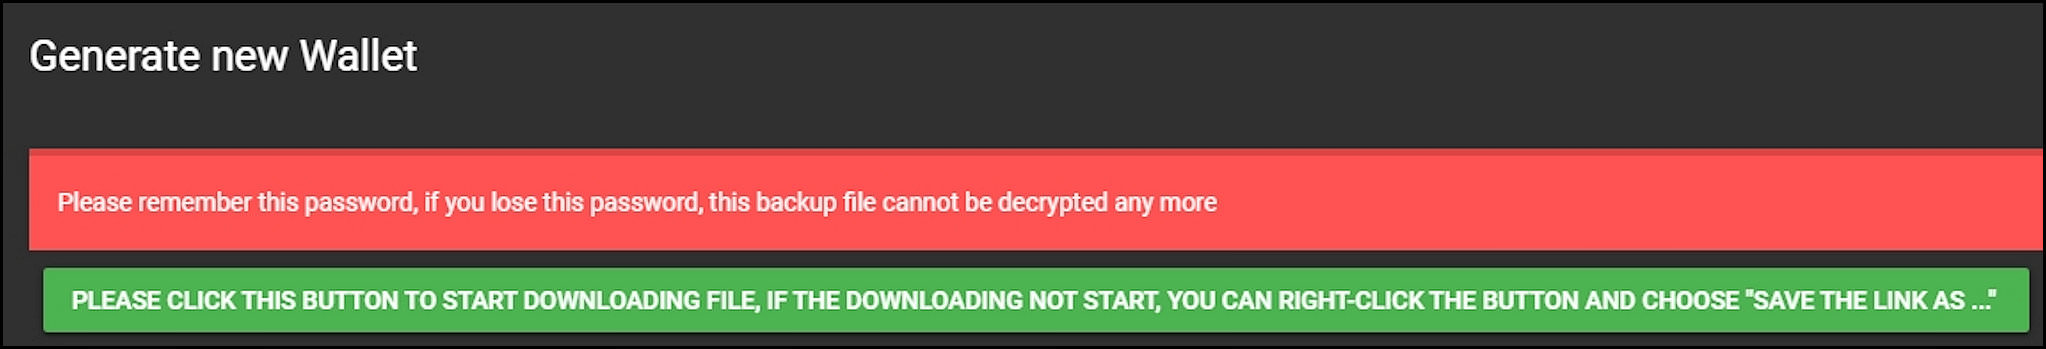 4. Download Key File